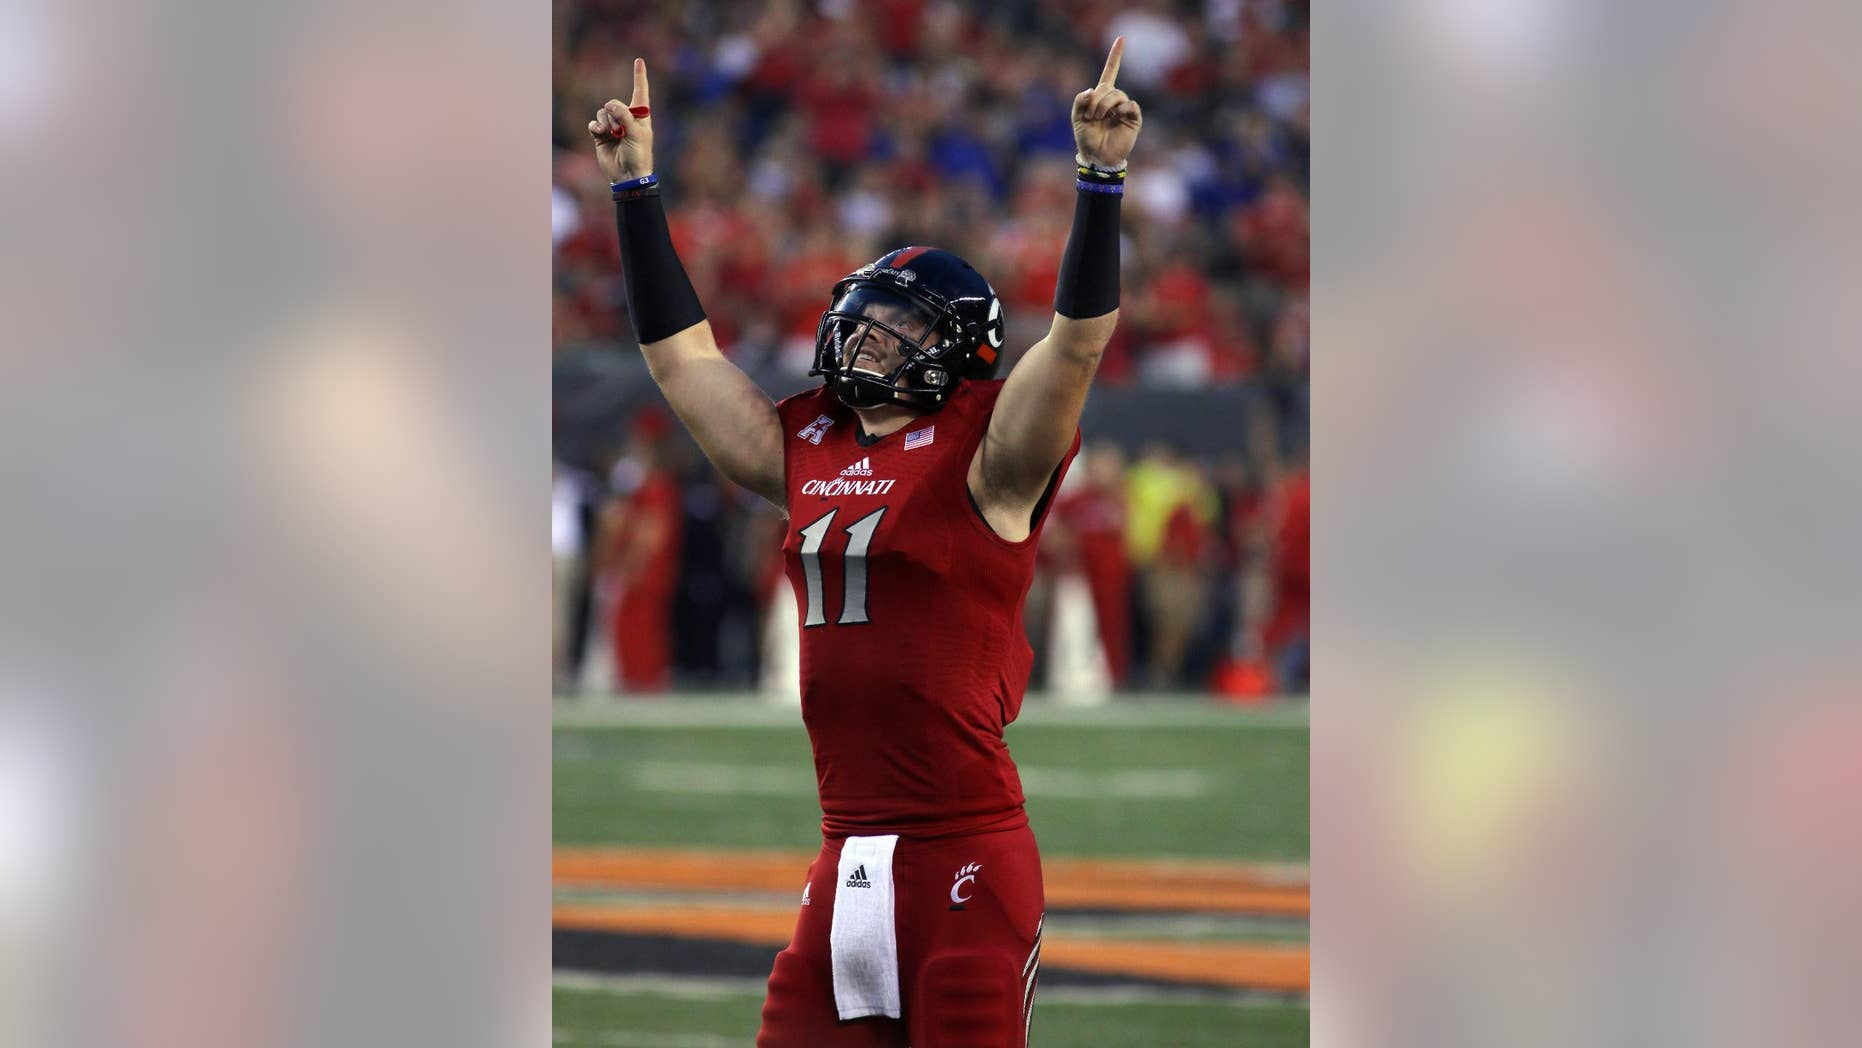 Cincinnati quarterback Gunner Kiel reacts after his team scored against Miami (Ohio) in the first half of an NCAA college football game in Cincinnati, Saturday, Sept. 20, 2014. (AP Photo/Tom Uhlman)